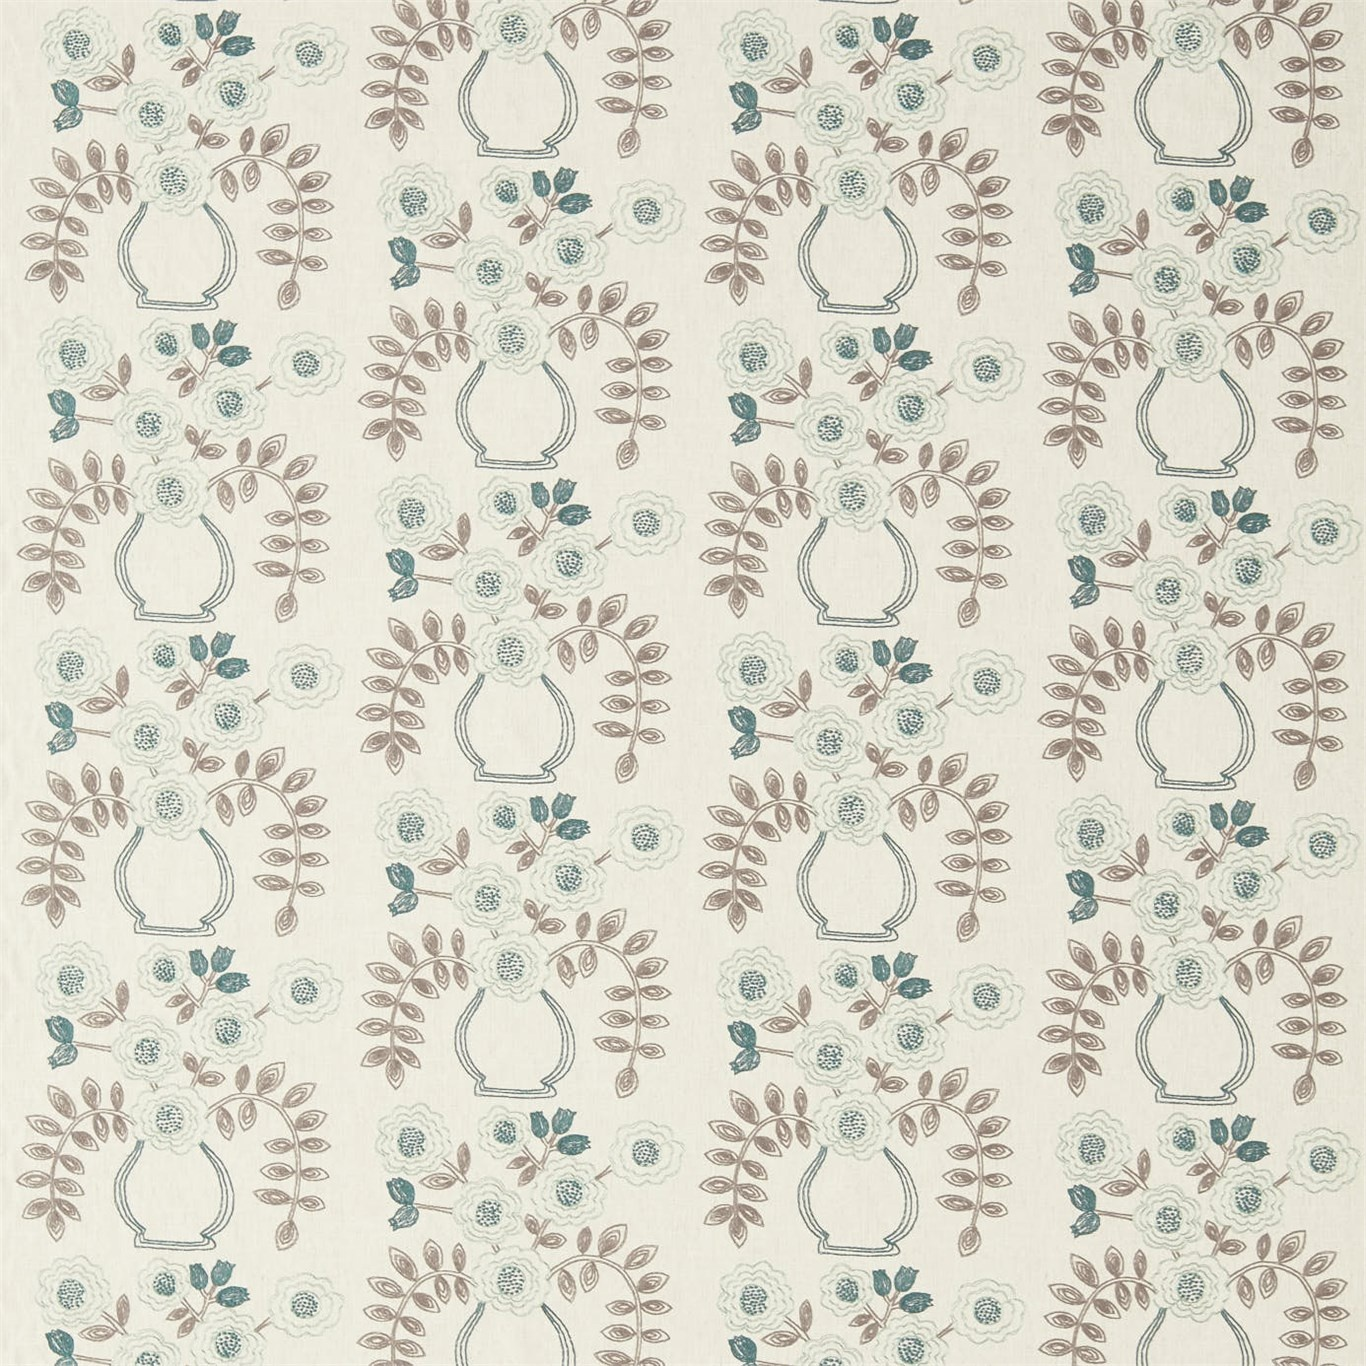 Image of Sanderson Home Flower Pot Winter Rocket Curtain Fabric 235879